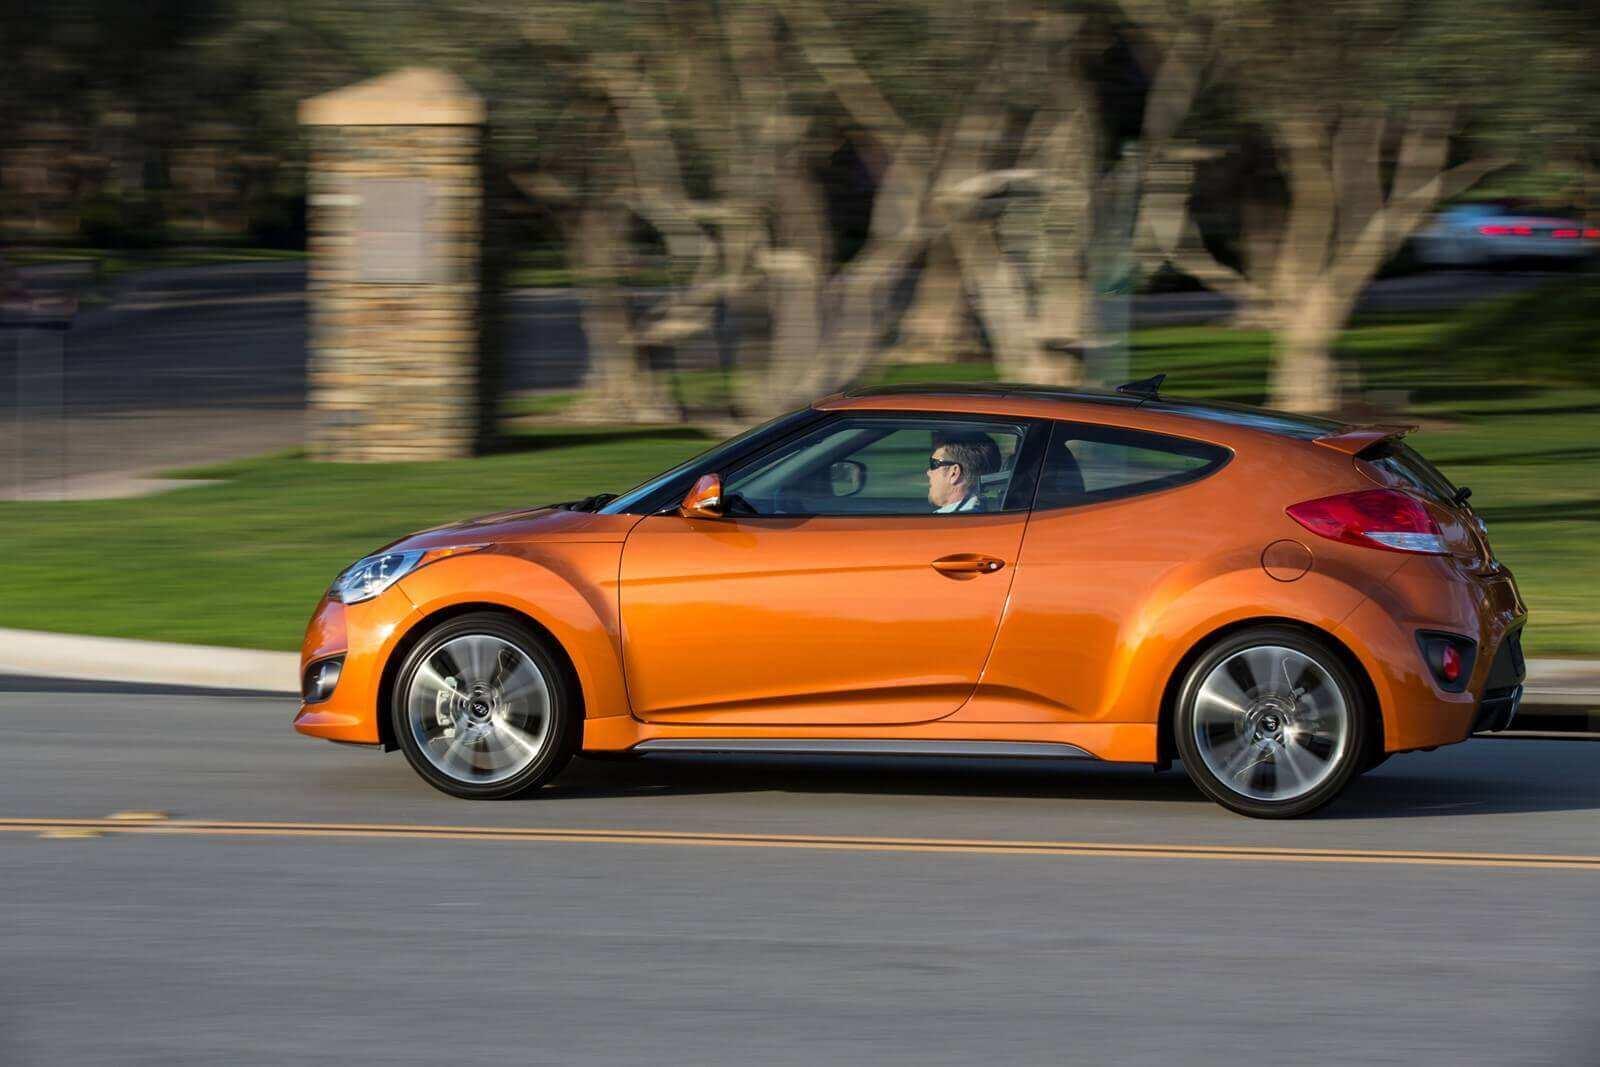 62 Great 2020 Hyundai Veloster Turbo Ratings by 2020 Hyundai Veloster Turbo